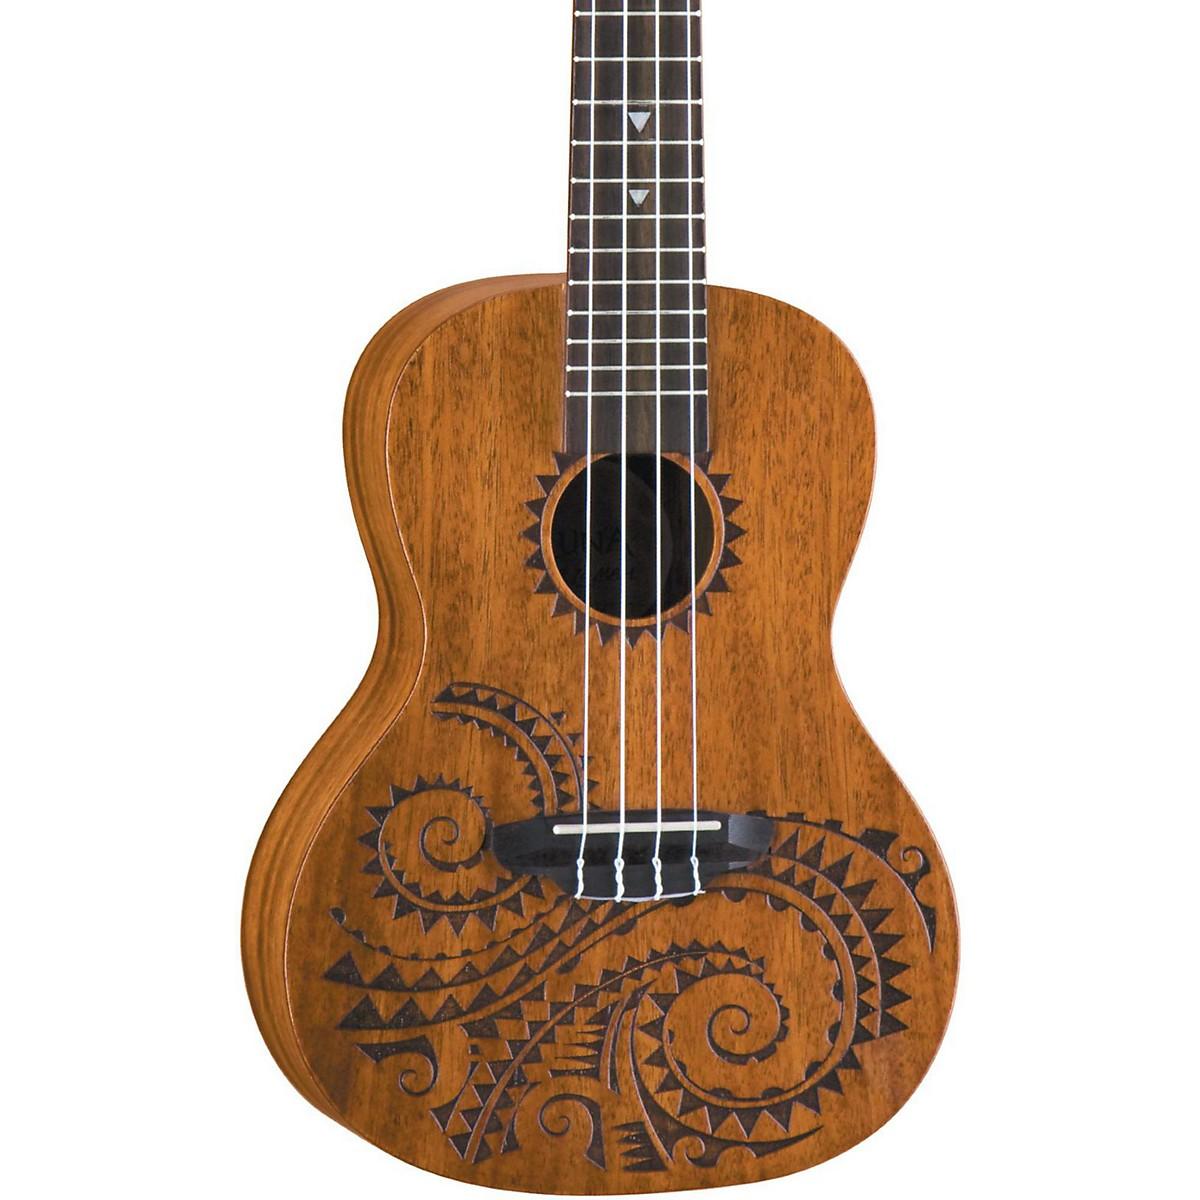 Luna Guitars Tattoo Concert Mahogany Ukulele